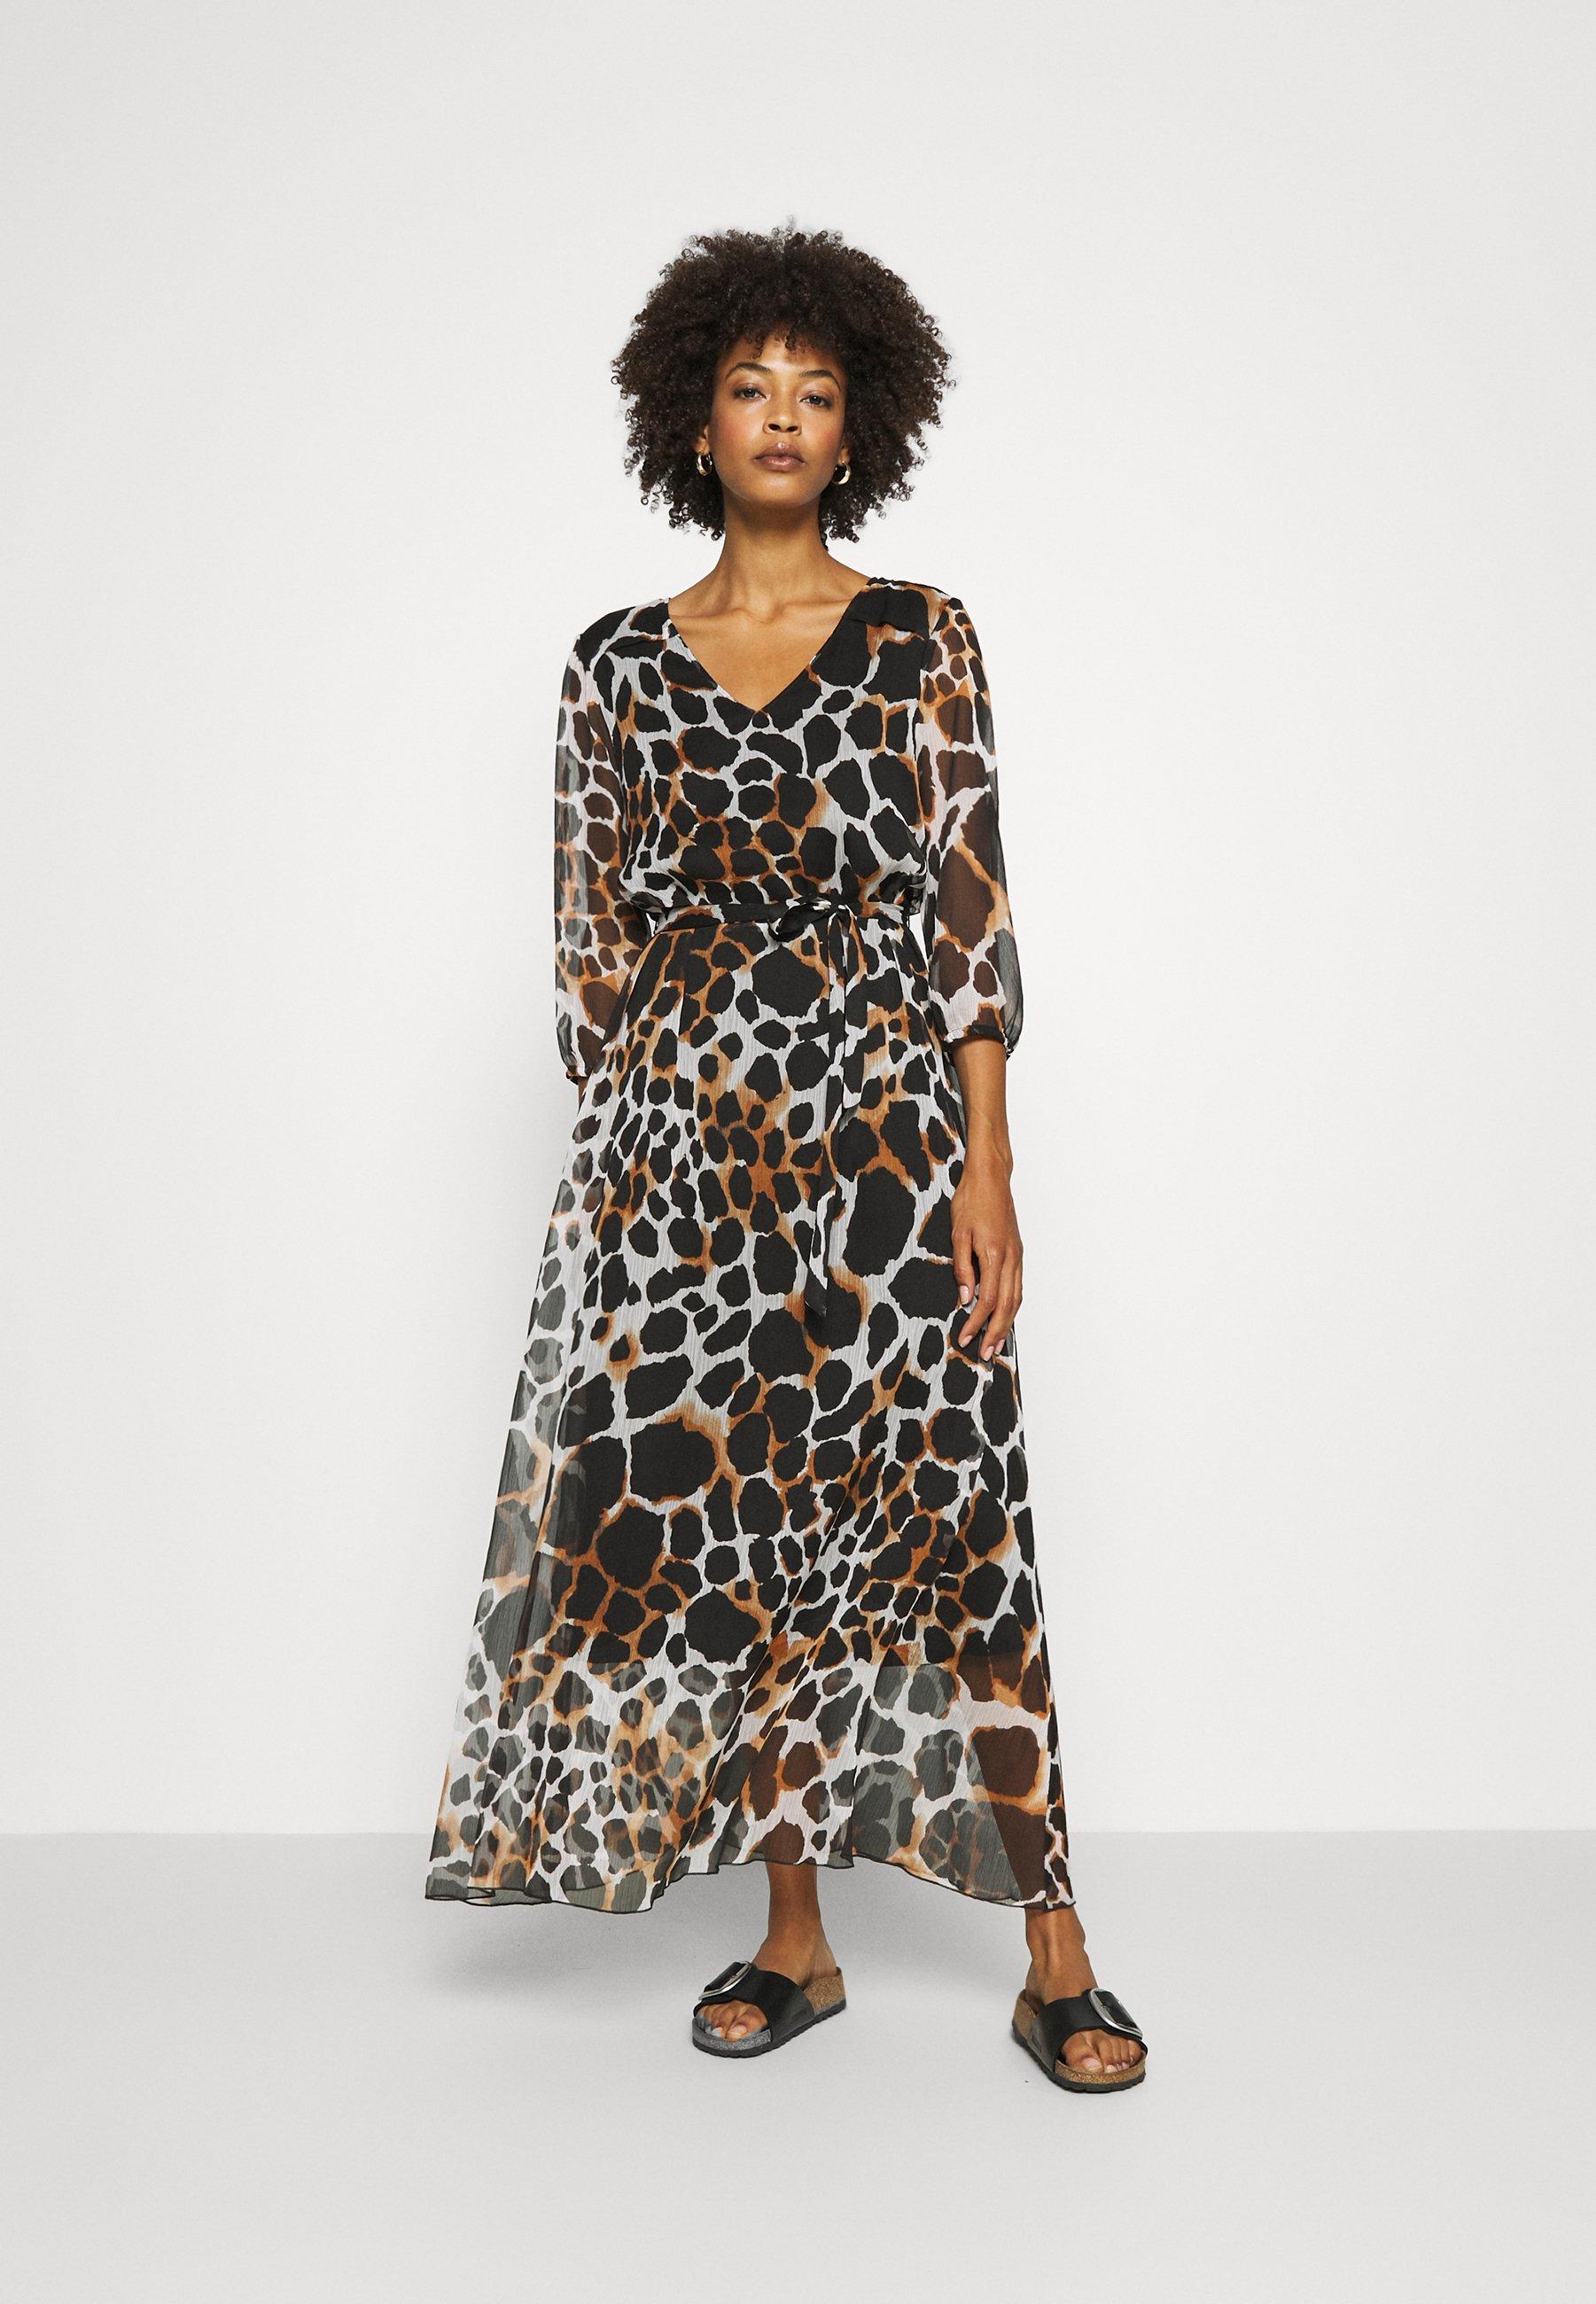 Fast Delivery Exclusive Women's Clothing Cartoon LANG Maxi dress grey/black DwCvjRcoq 7mf3FDNNY